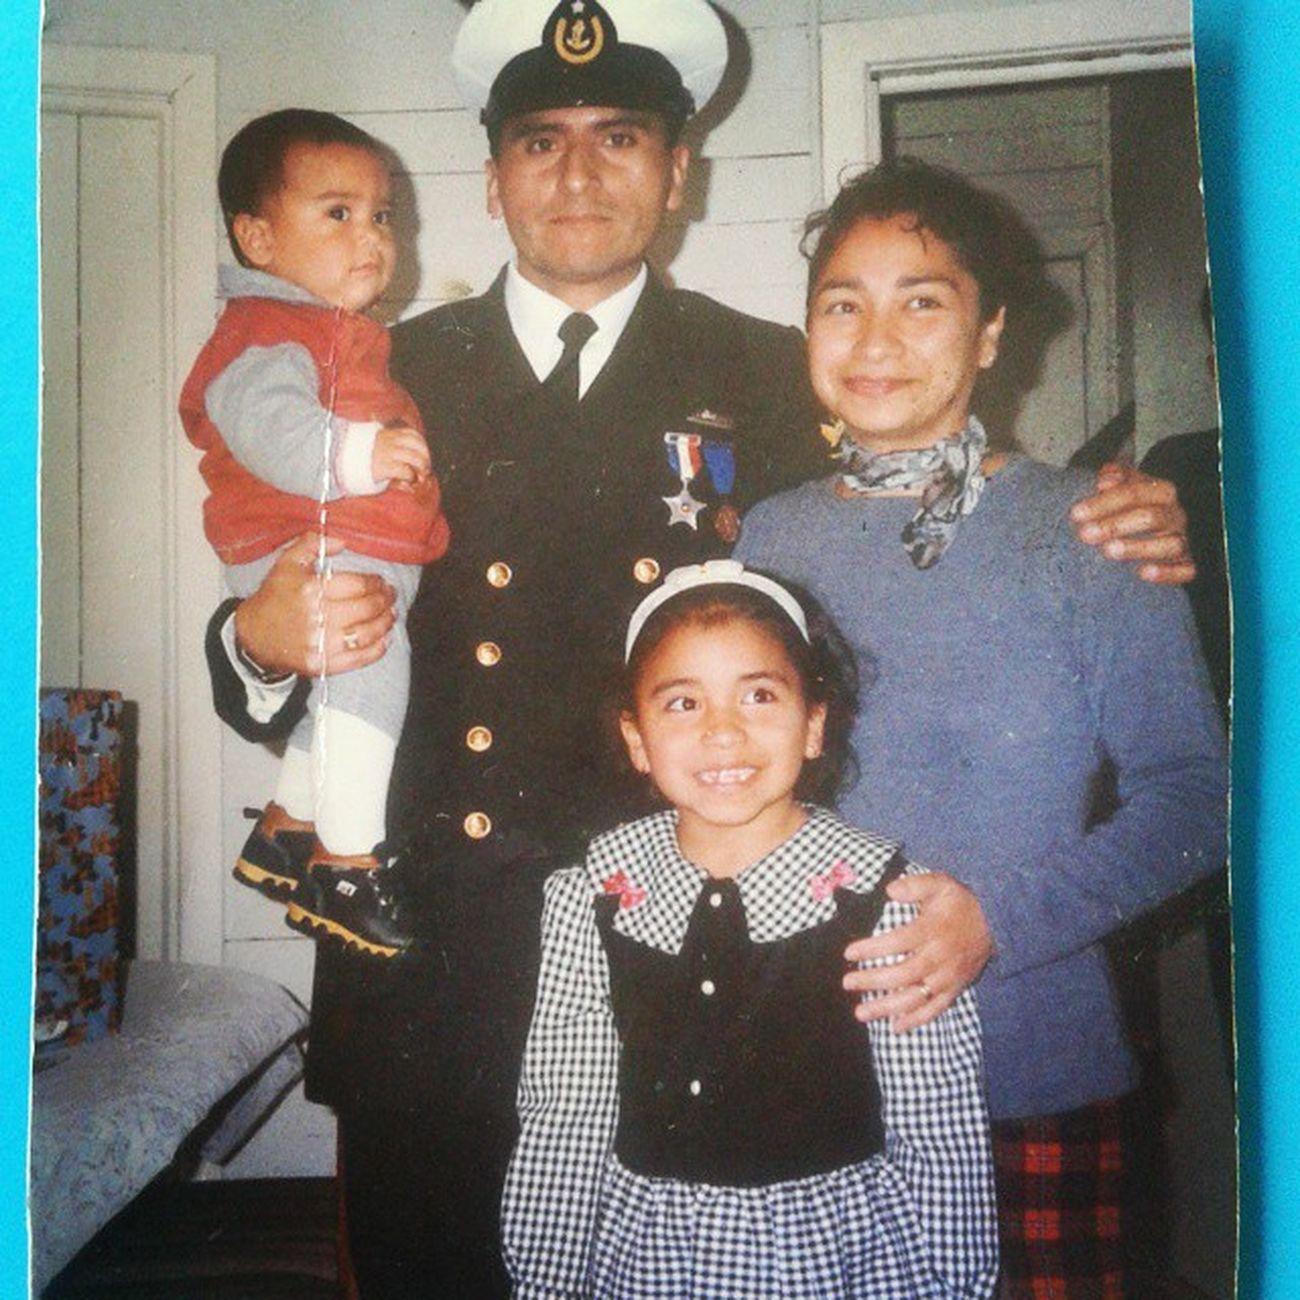 Recuerdoooos :') 2000 Memories Family 21deMayo CabrosChicos ♥